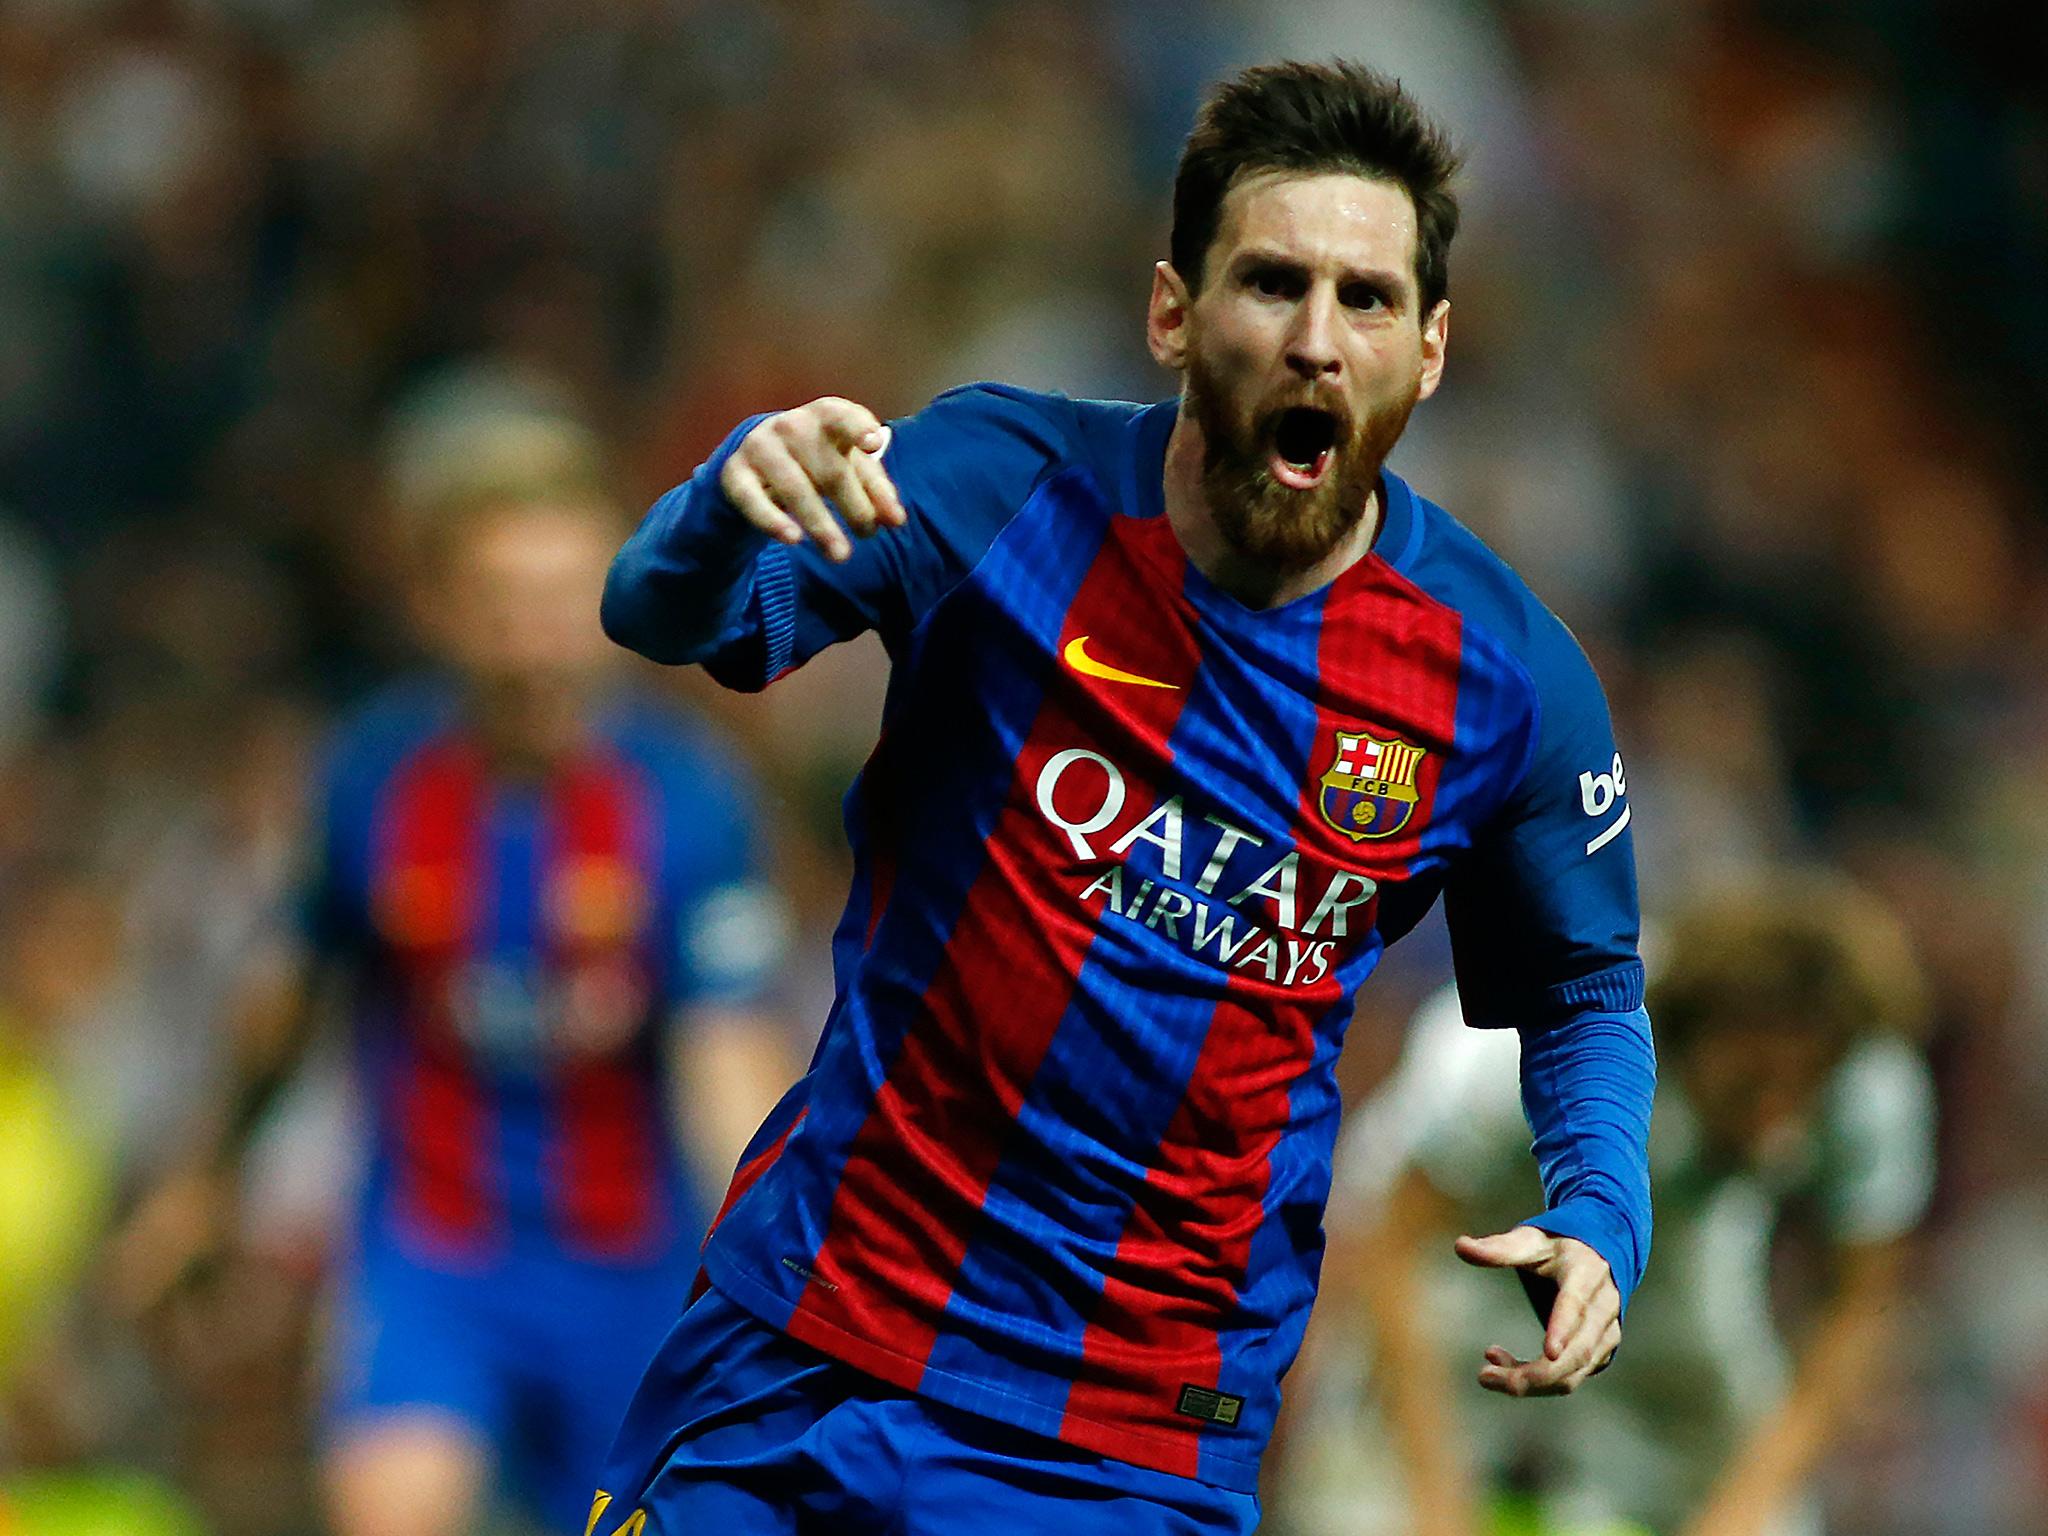 Fc Barcelona Desktop Wallpaper Hd Lionel Messi Wallpapers Hd Download Free Pixelstalk Net